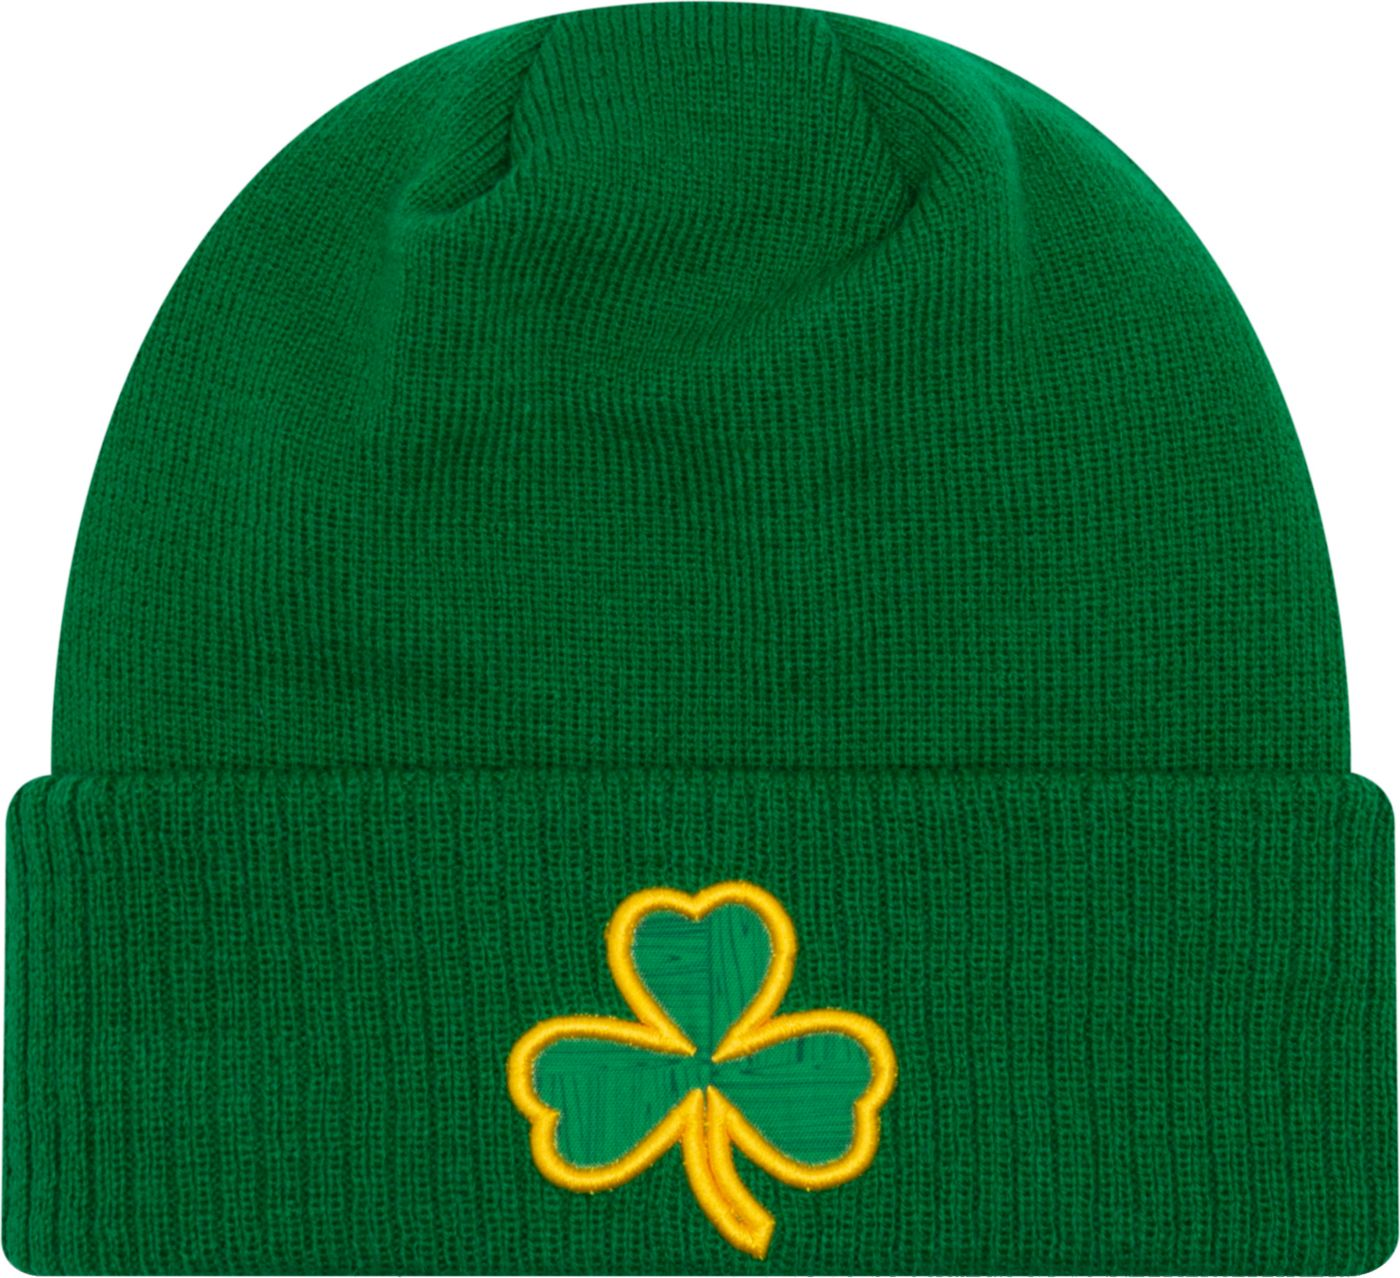 New Era Men's Boston Celtics City Edition Knit Hat